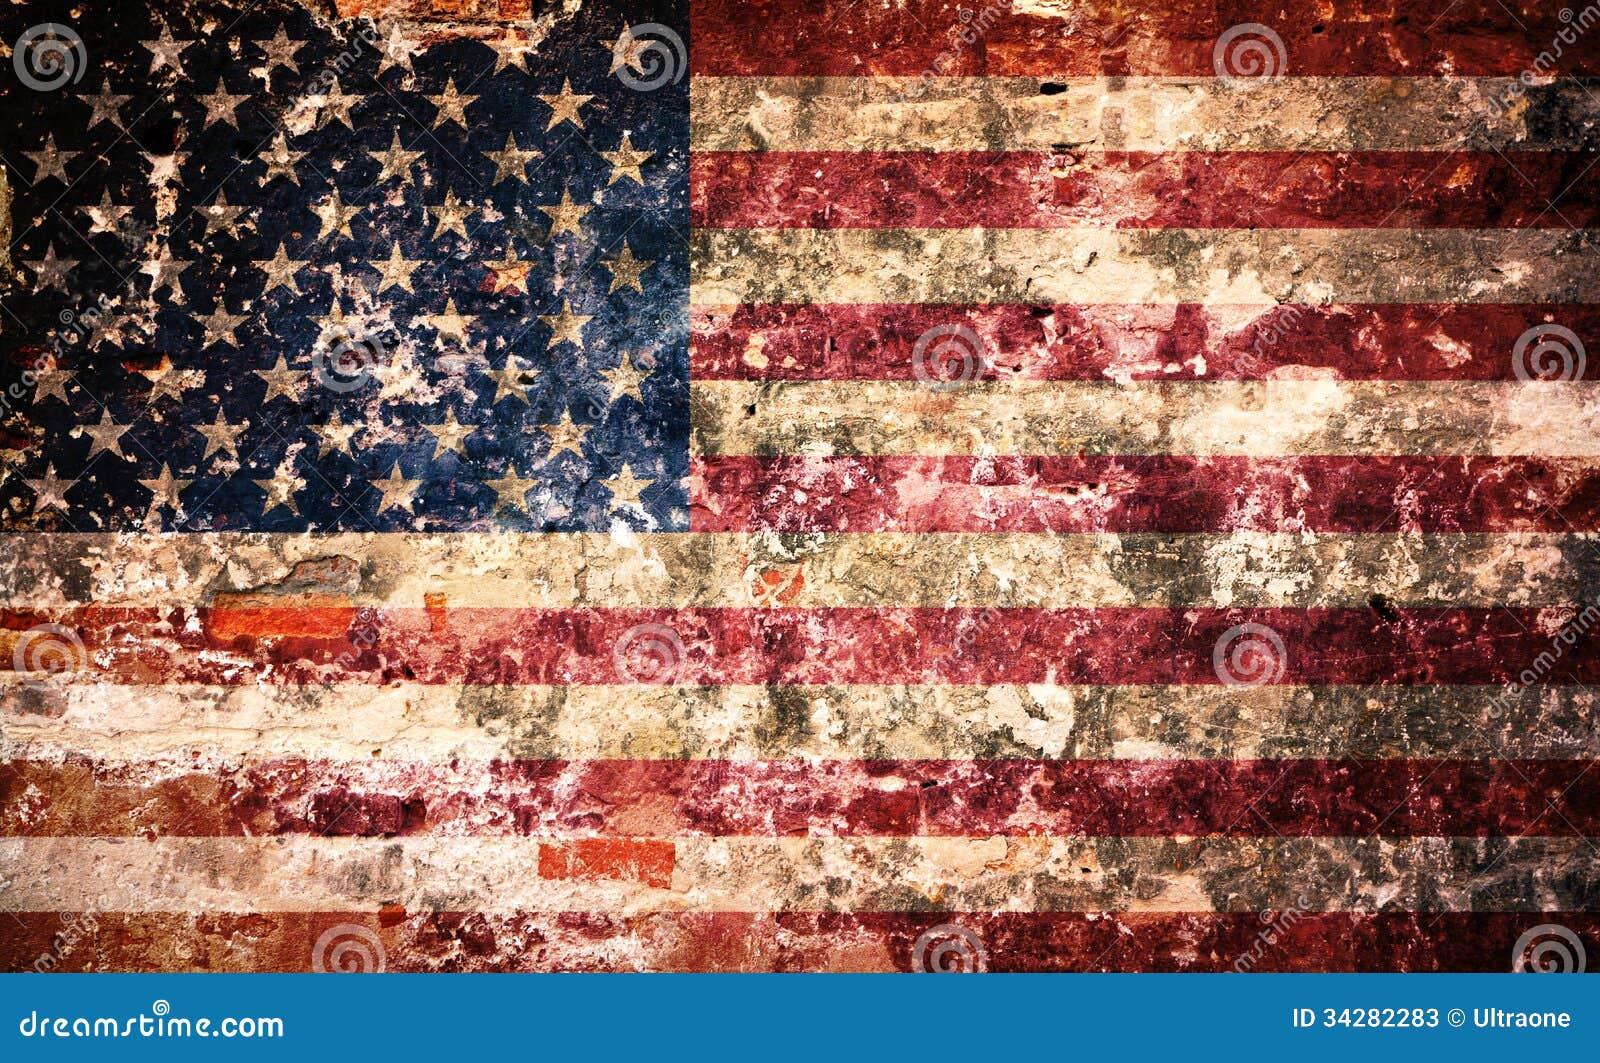 usa flag on peeling paint wall stock image image of